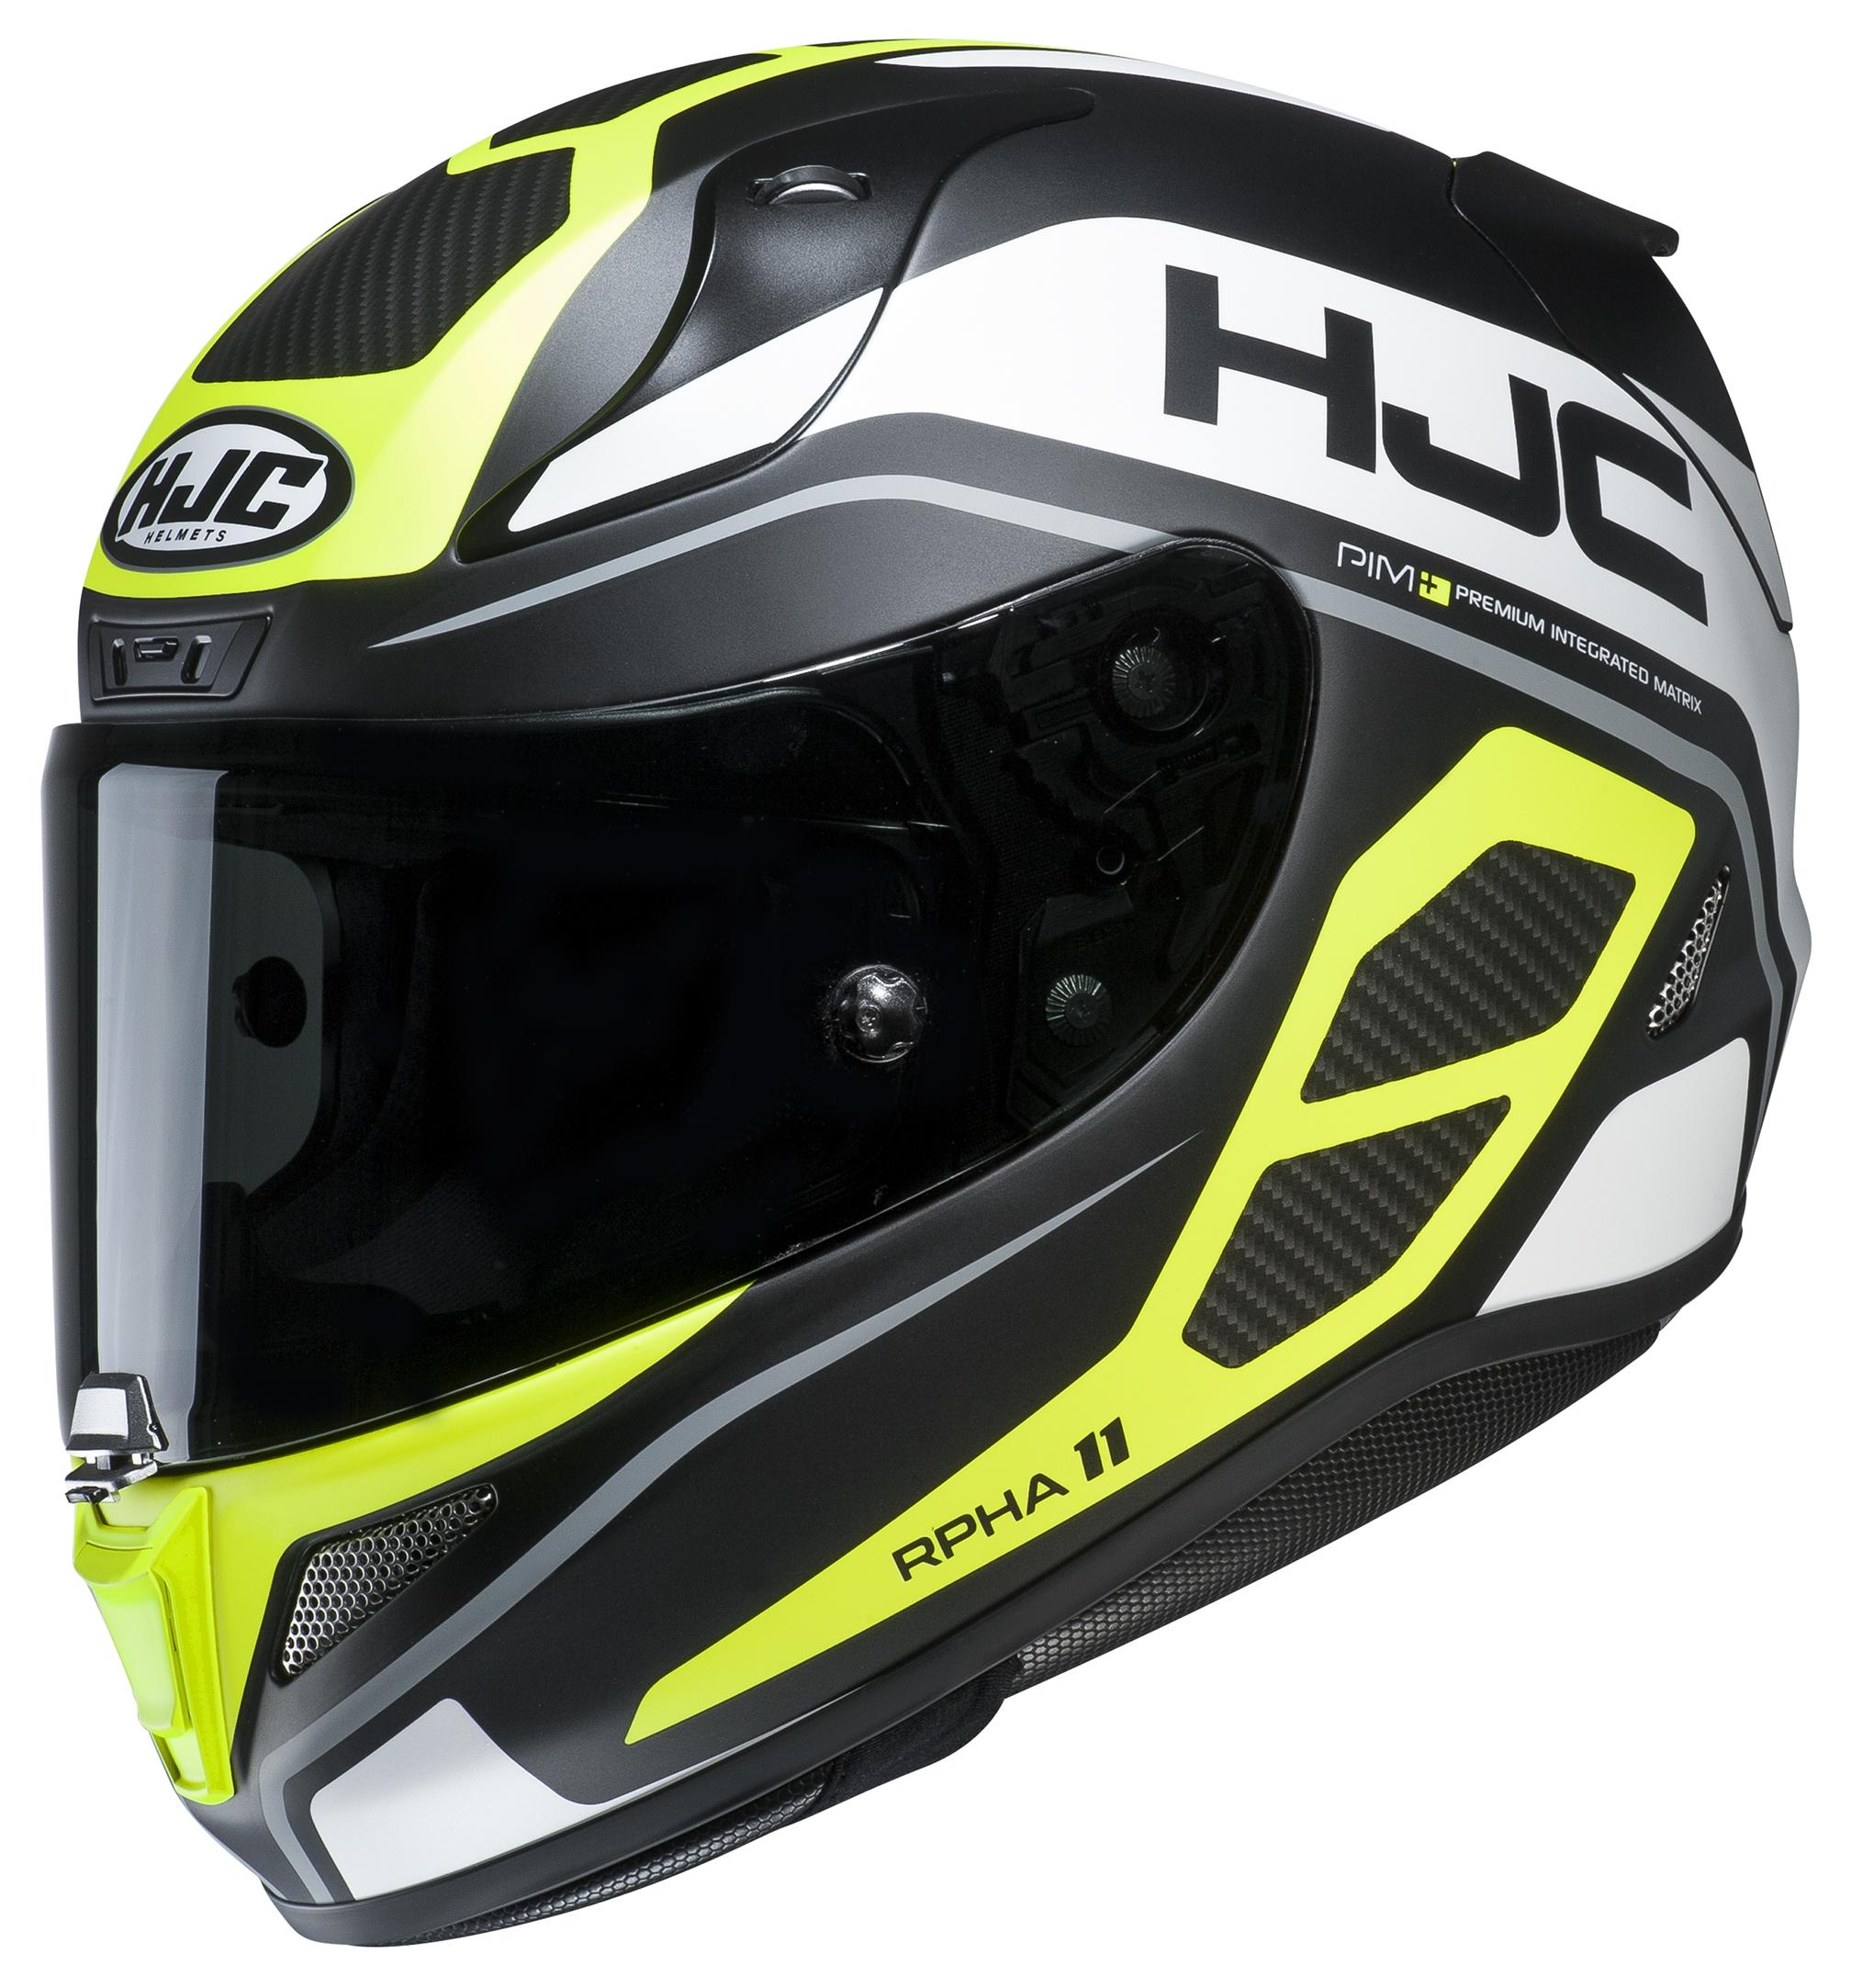 f1b810a0 HJC RPHA 11 Pro Saravo Helmet - Cycle Gear